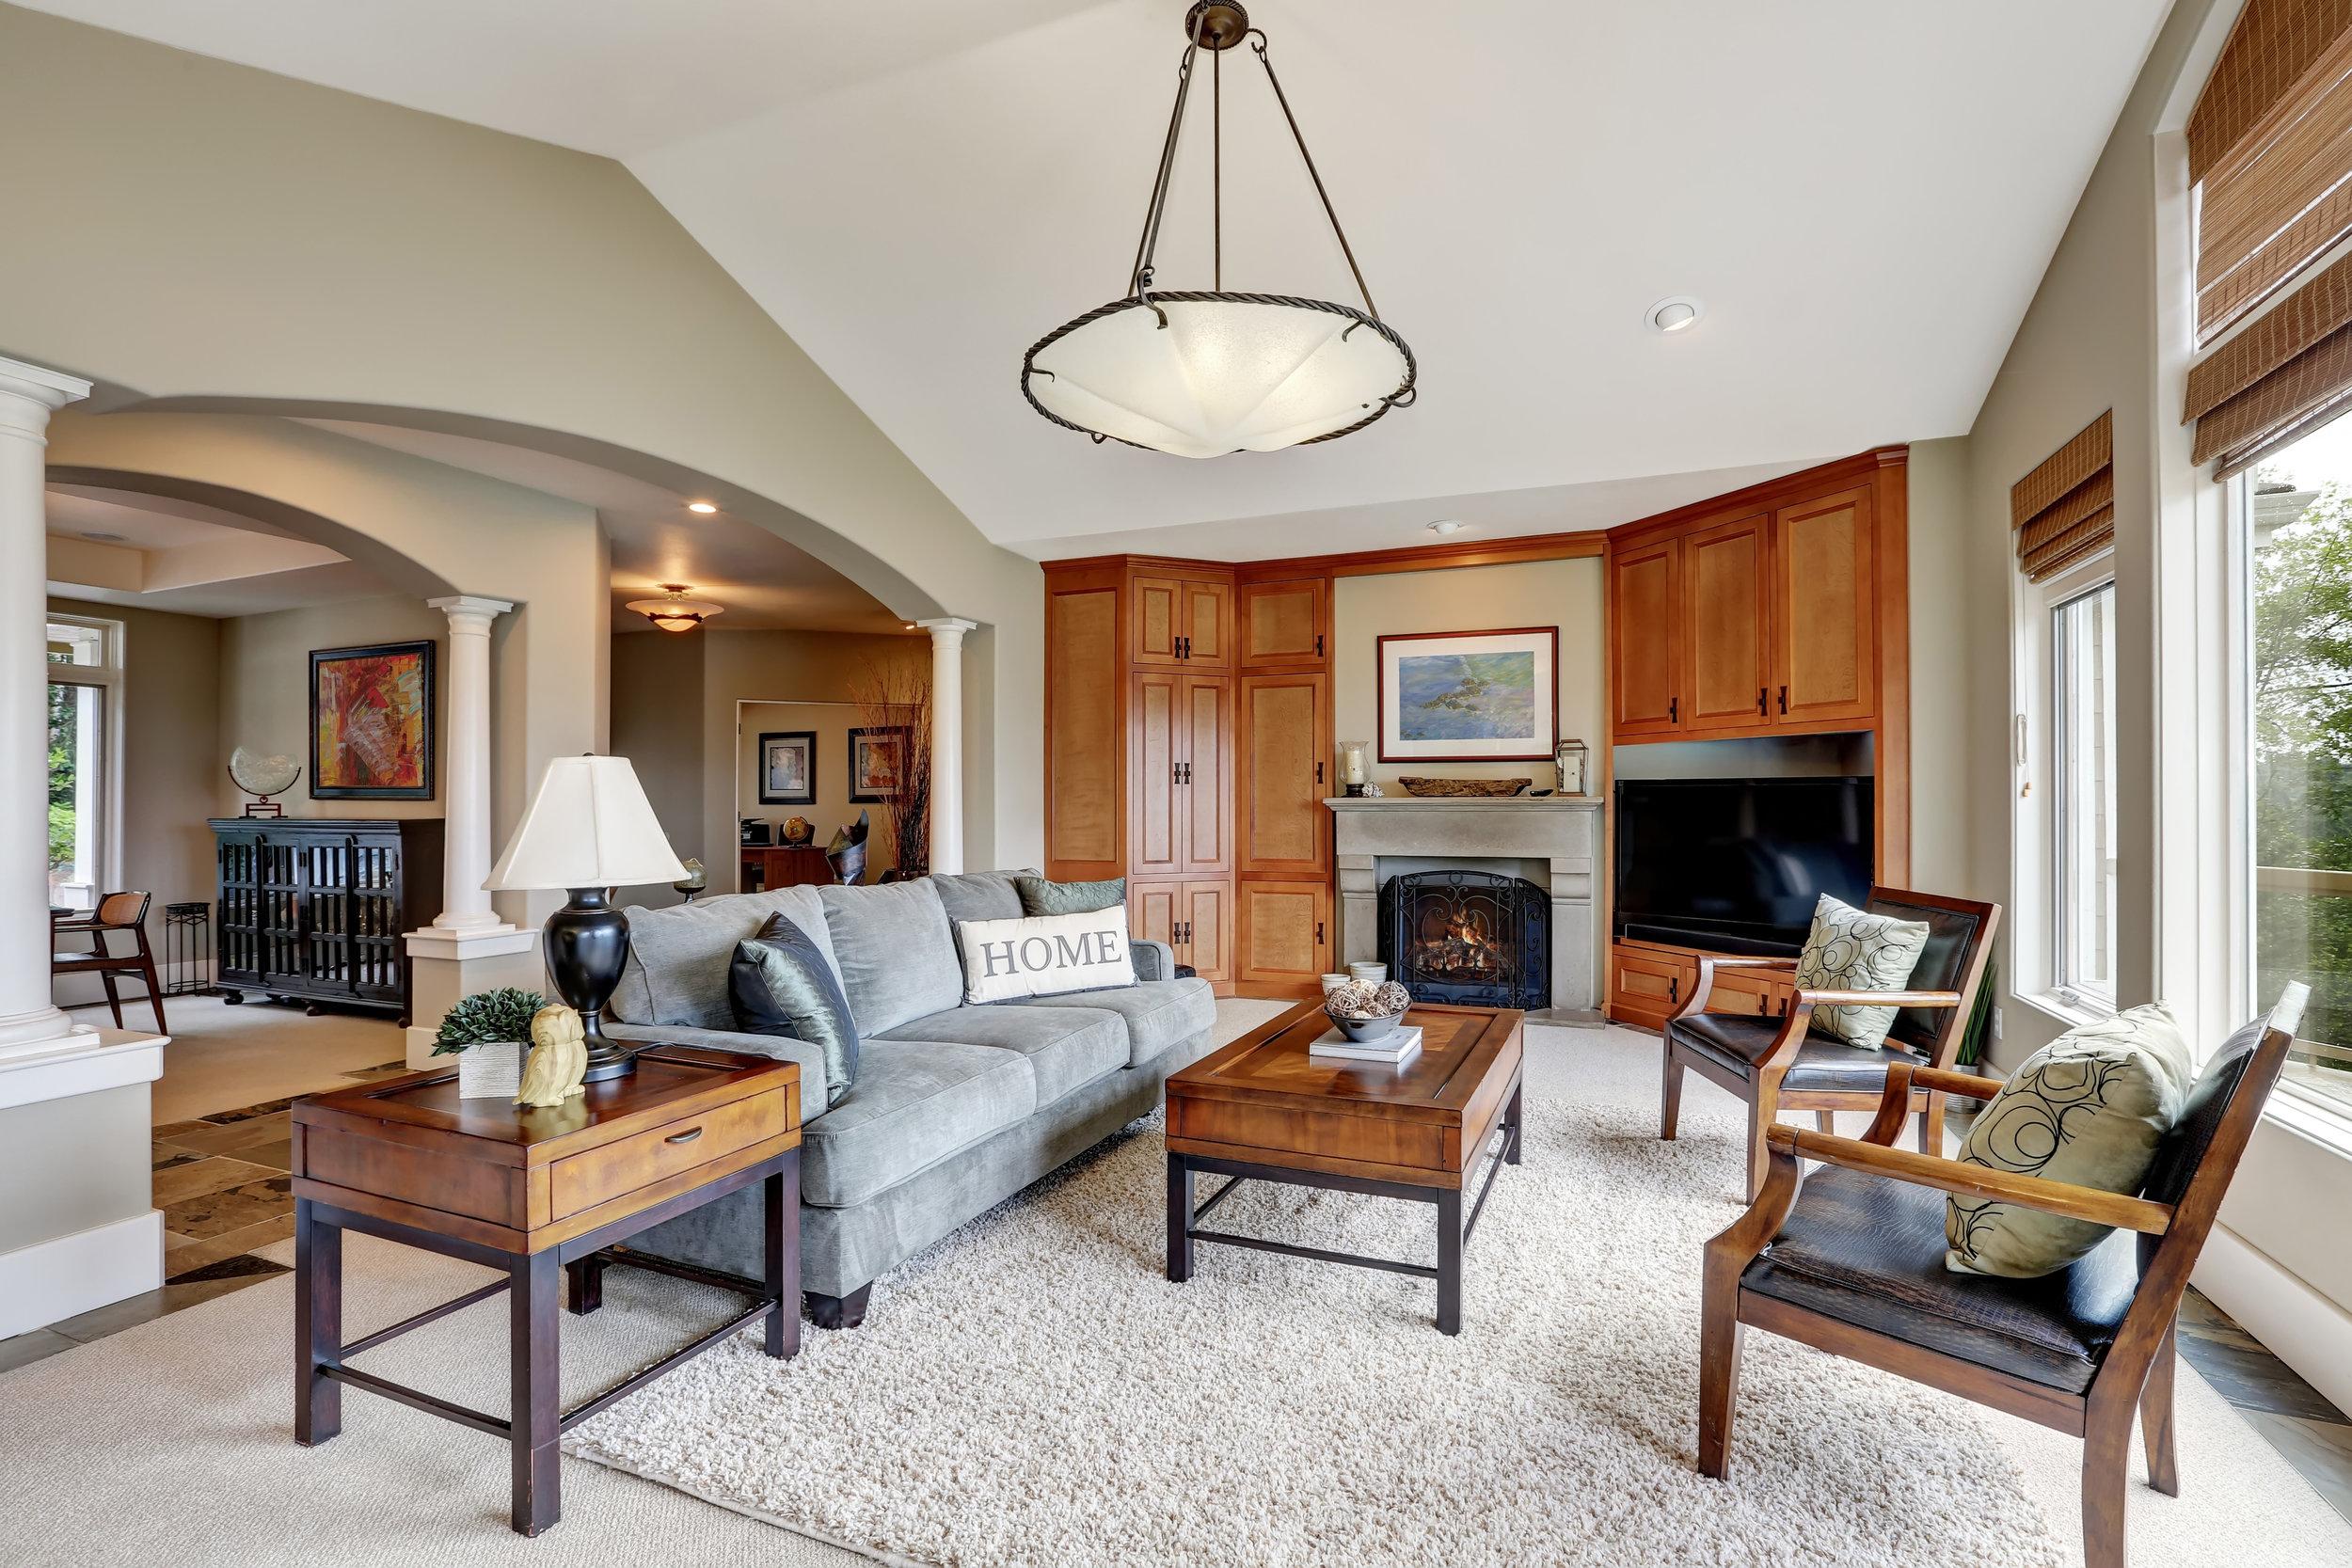 bigstock-Classic-Living-Room-Interior-I-153988349.jpg